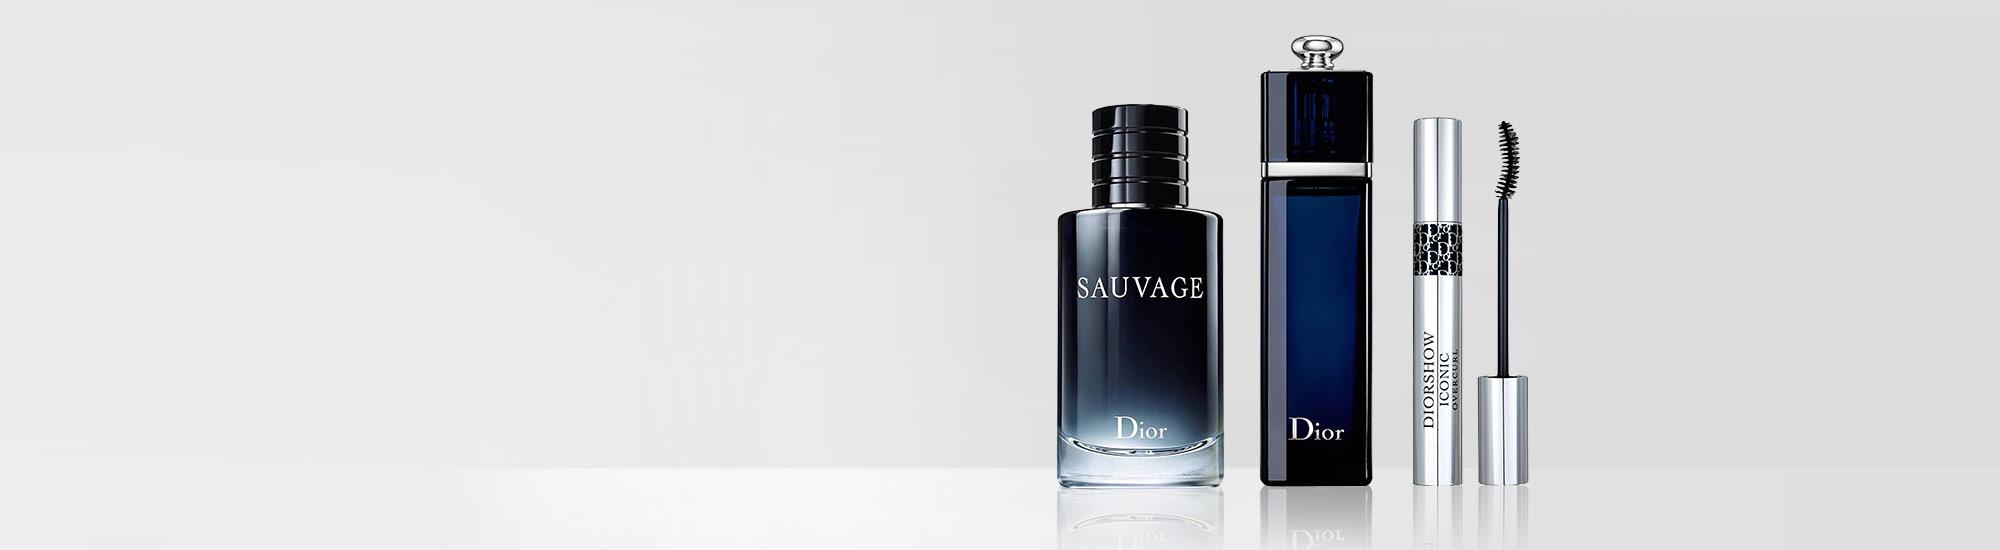 Dior Bestvalue Duty Free Experience